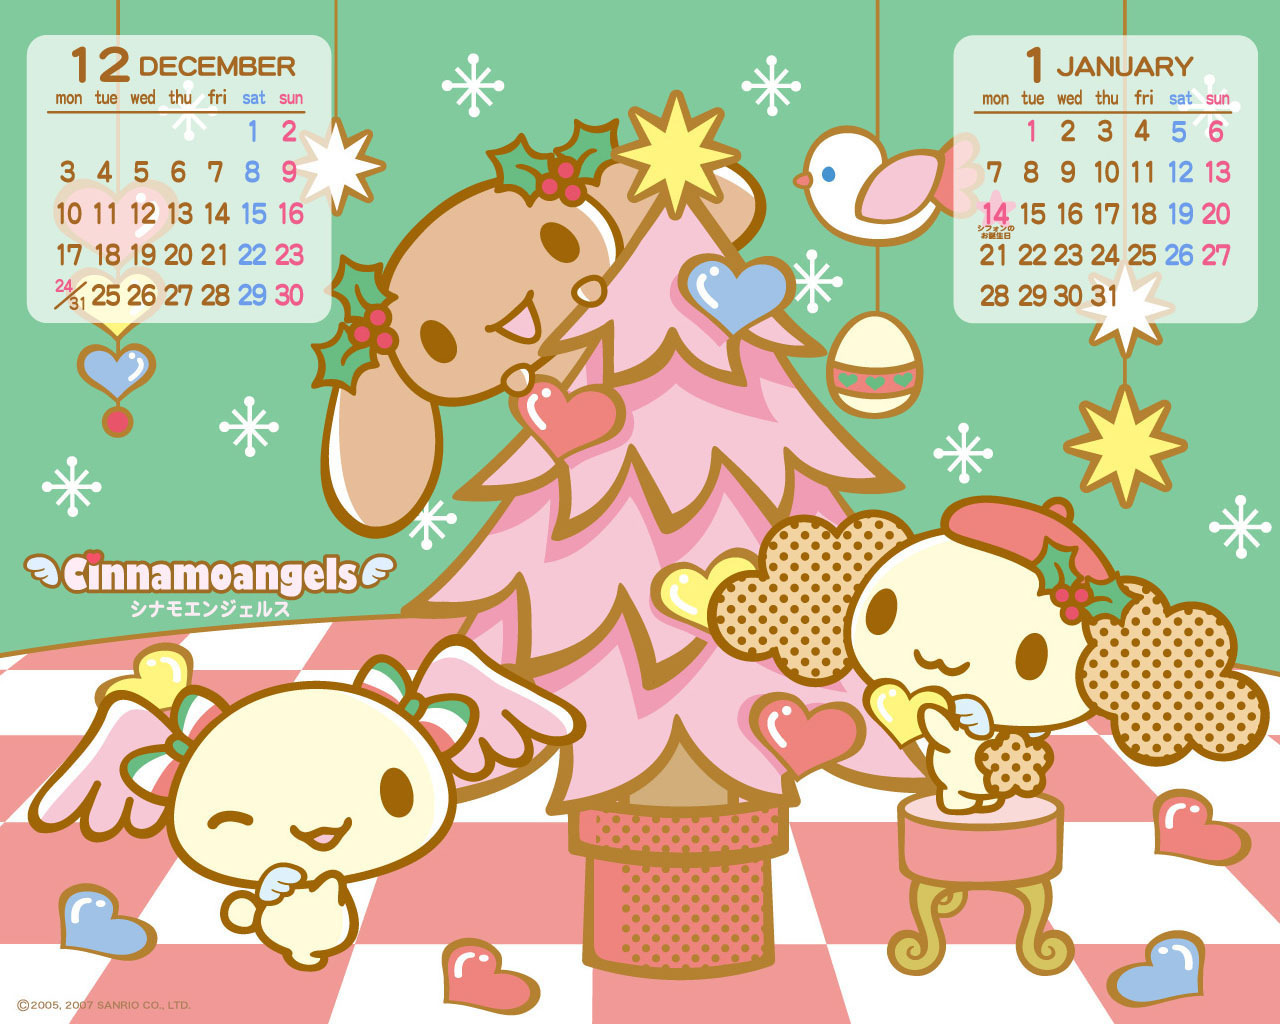 Cinnamoroll Images Cinnamoangels Calendar Wallpaper Dec Jan 2007 Hd